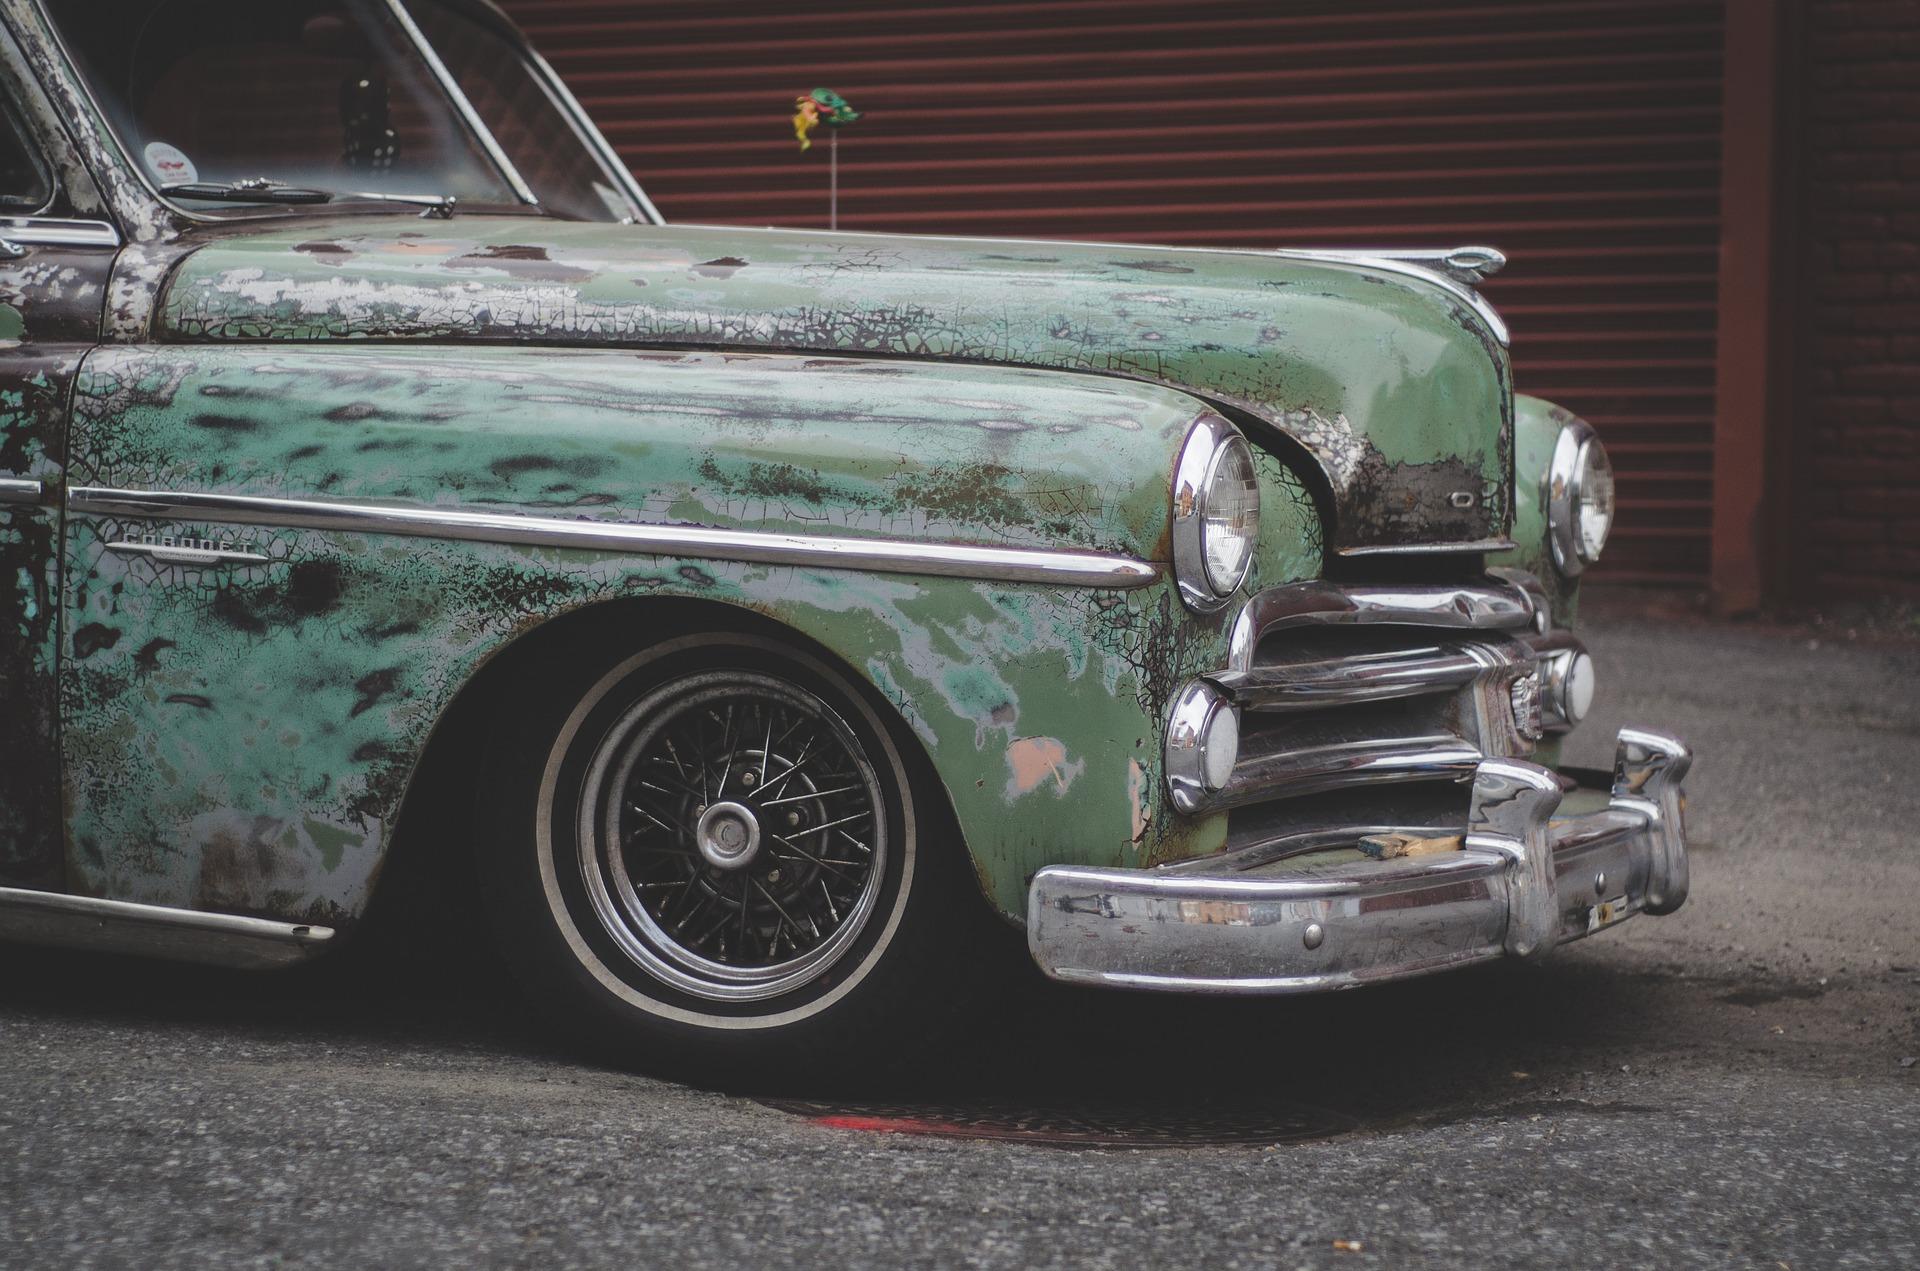 coche, 年份, 经典, 复古, 老, 脏, automov汽车��壁纸 - 教授-falken.com